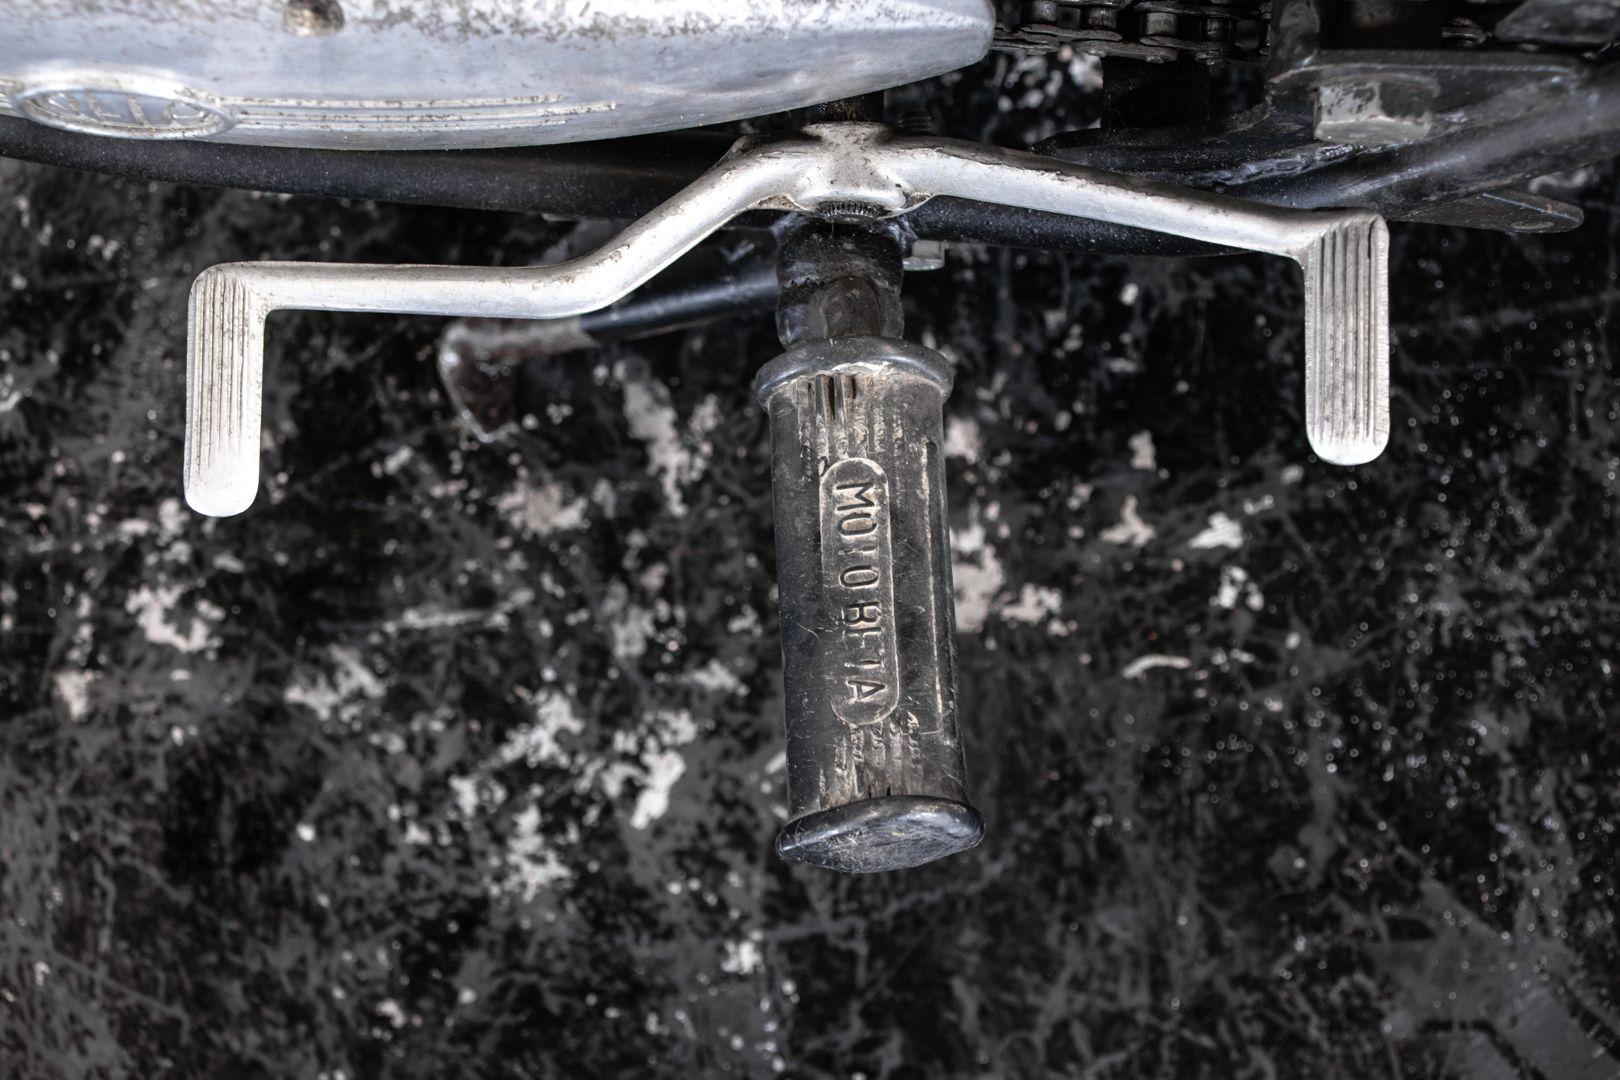 1969 Beta Camoscio 72032